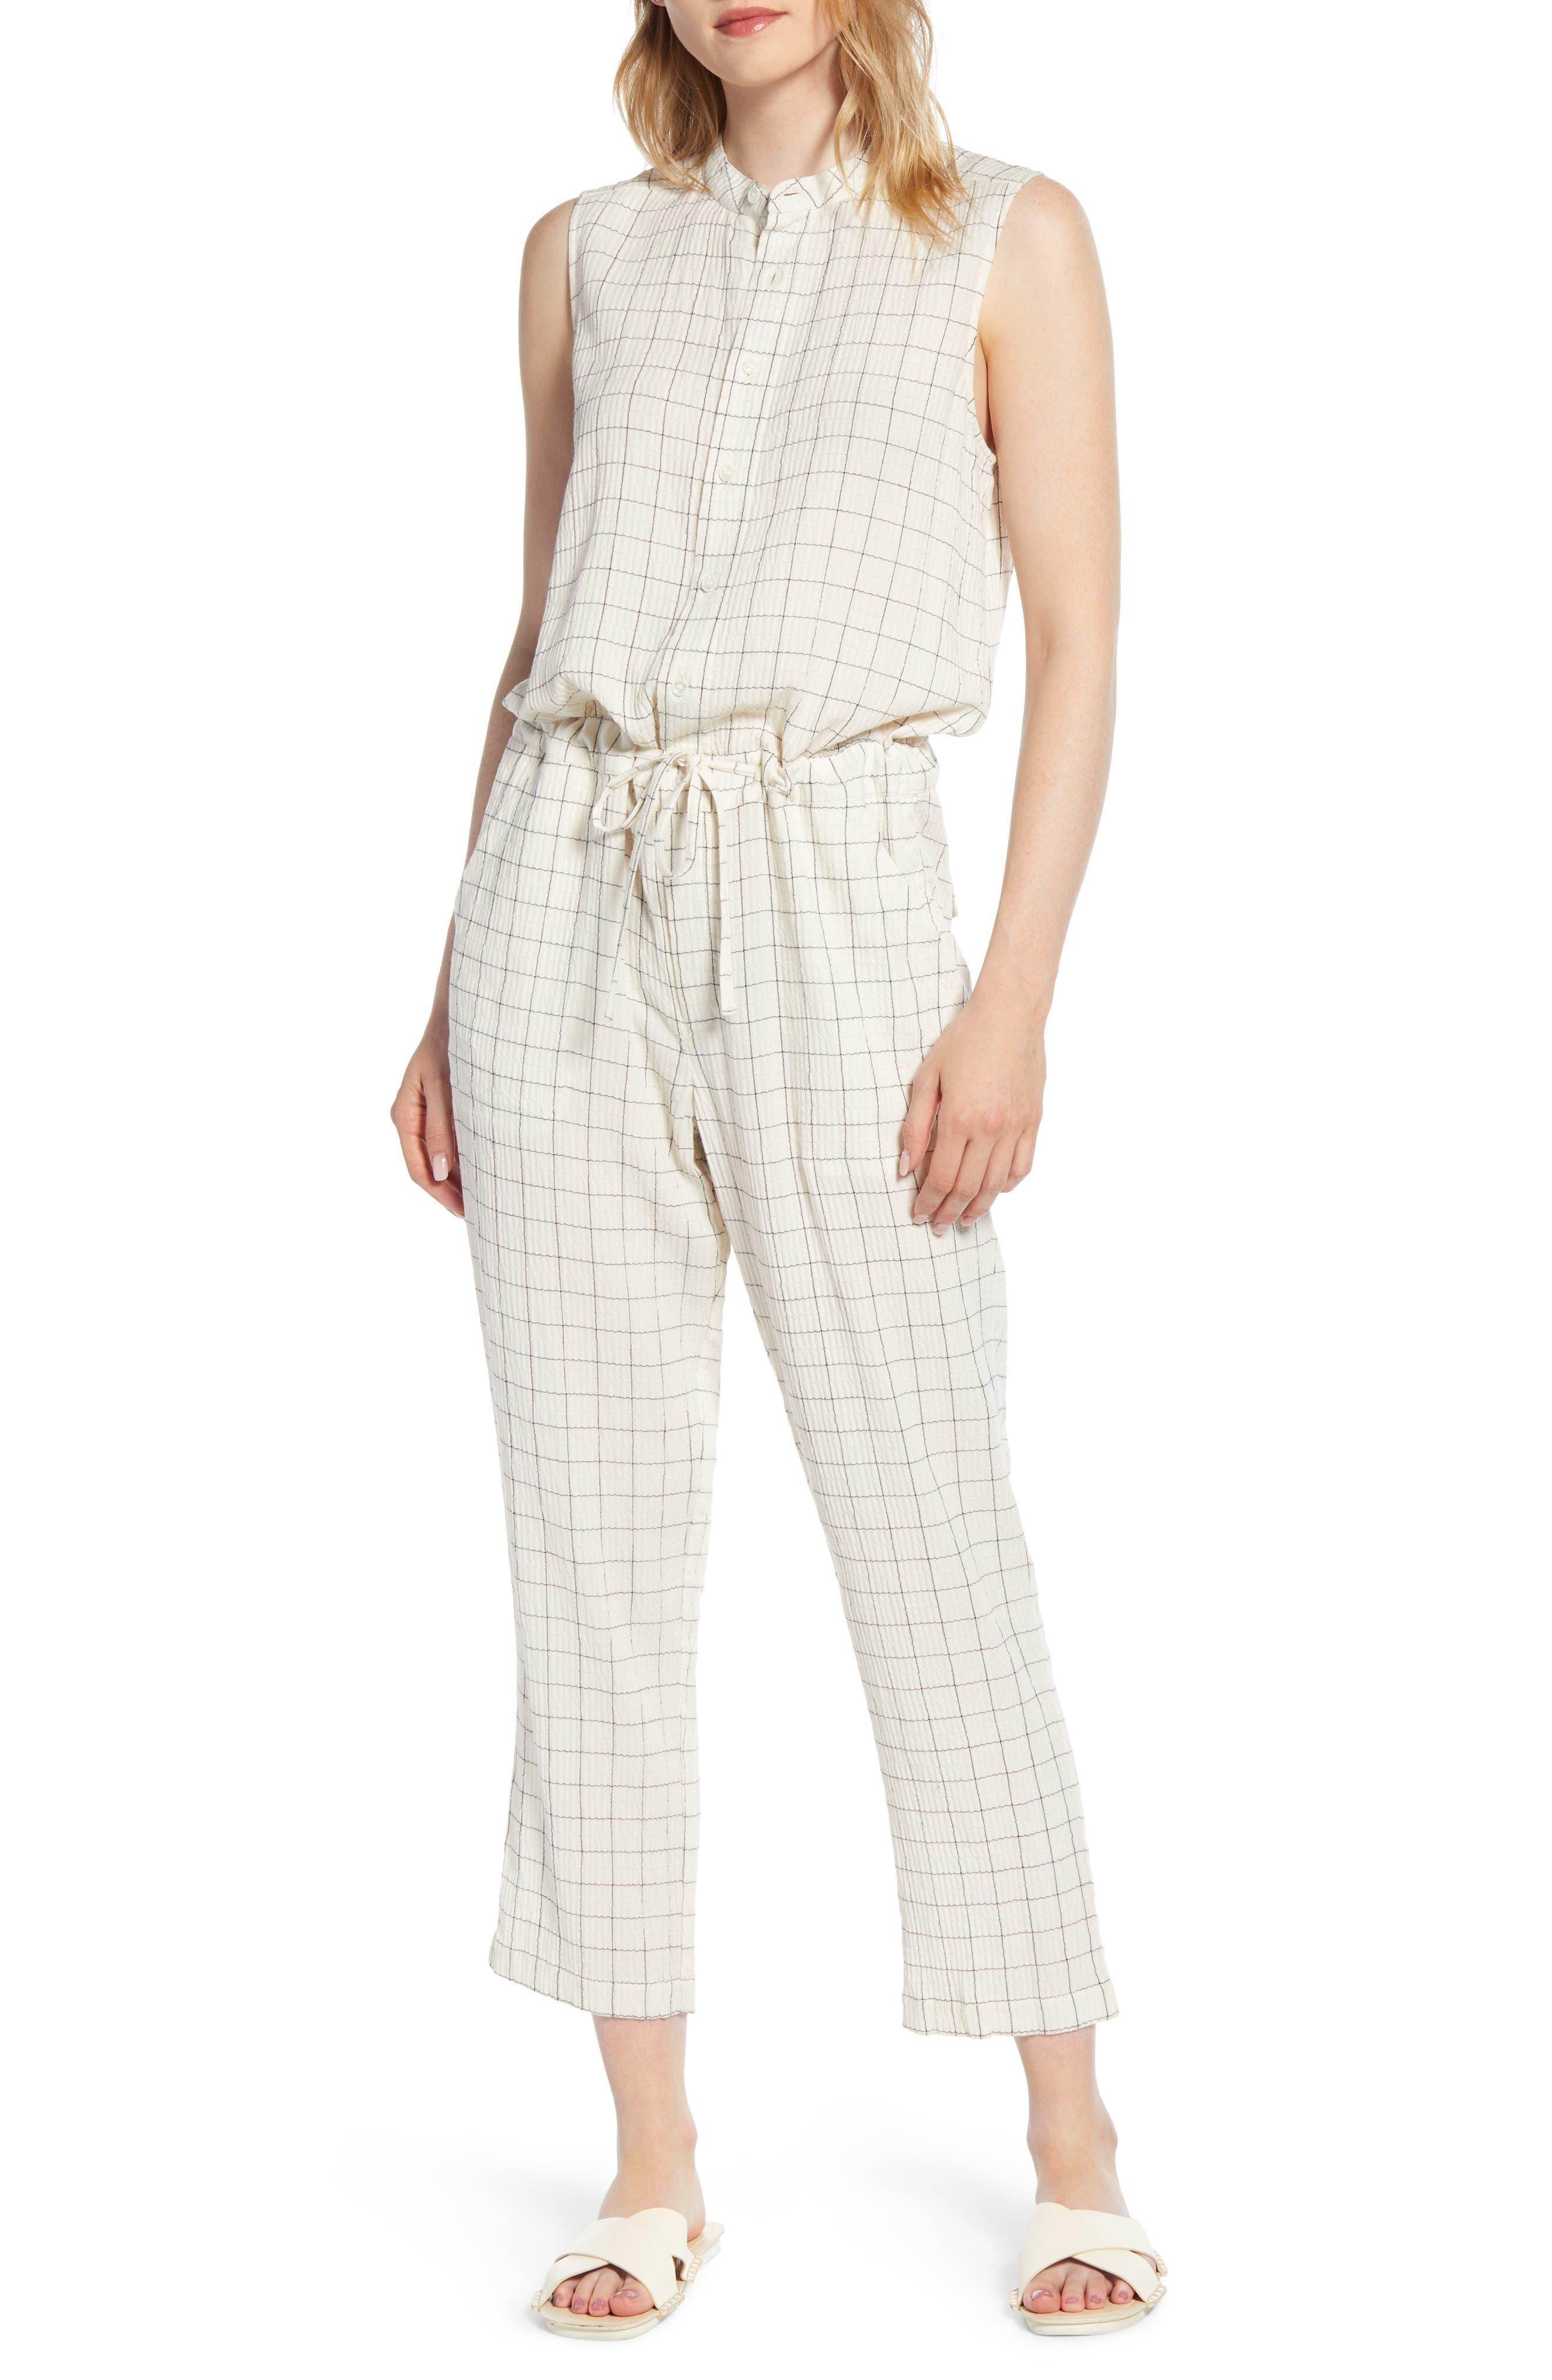 Lou & Grey Crinkled Plaid Sleeveless Jumpsuit, White